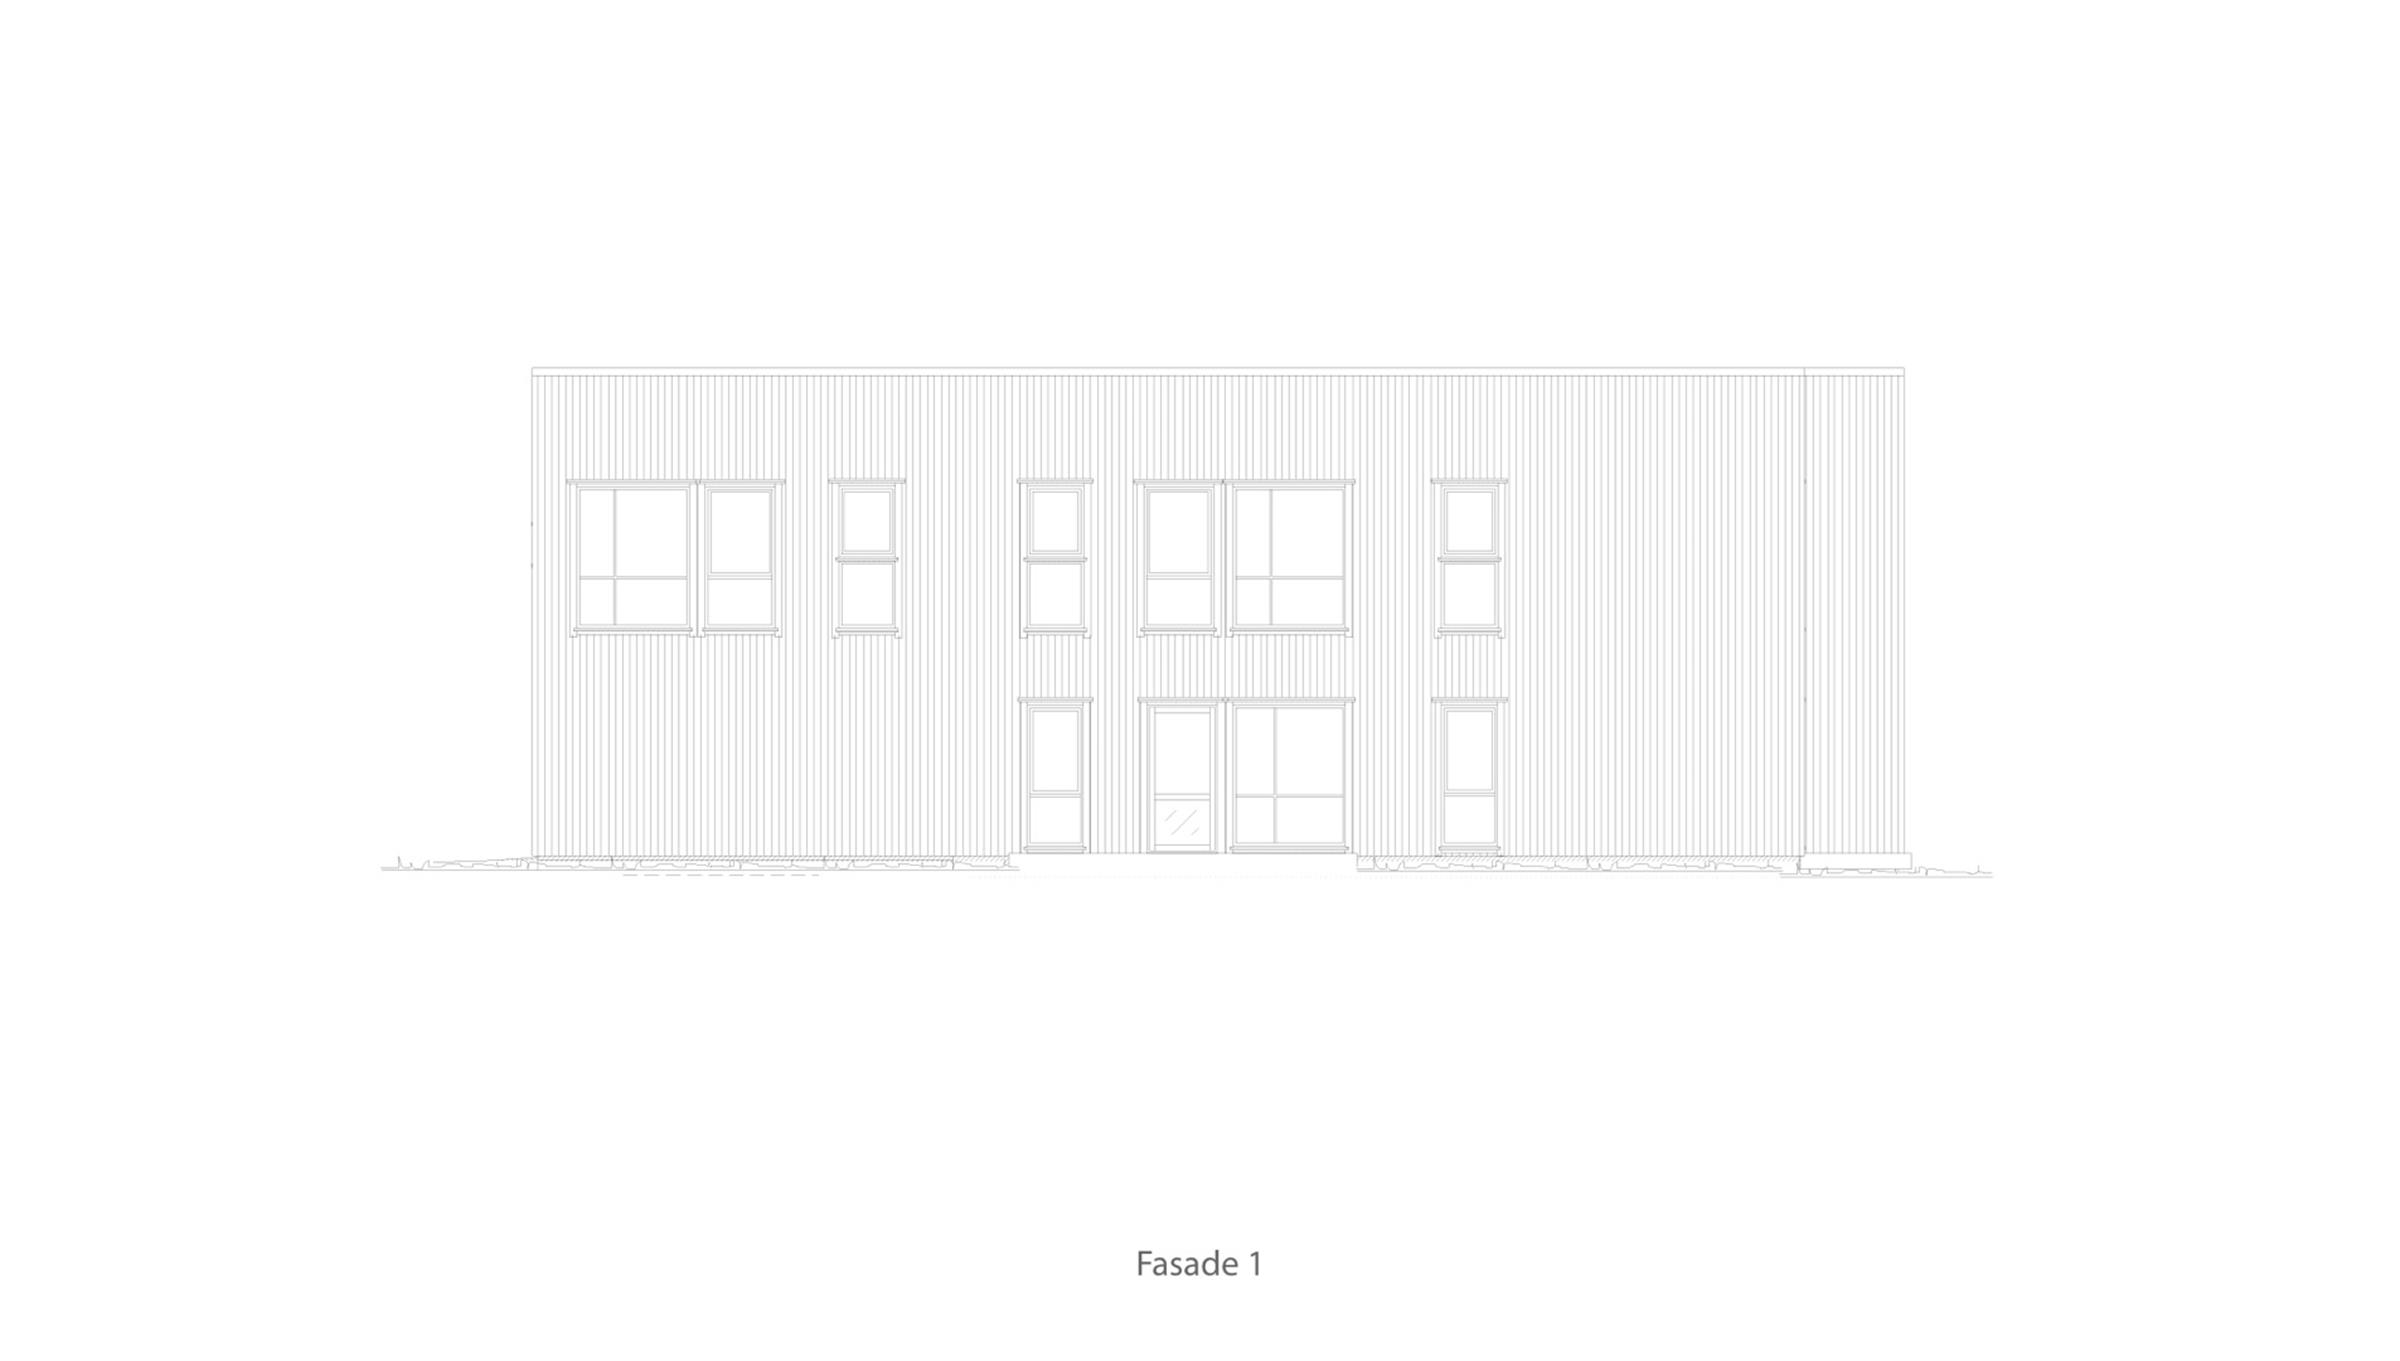 Moelv fasade 1